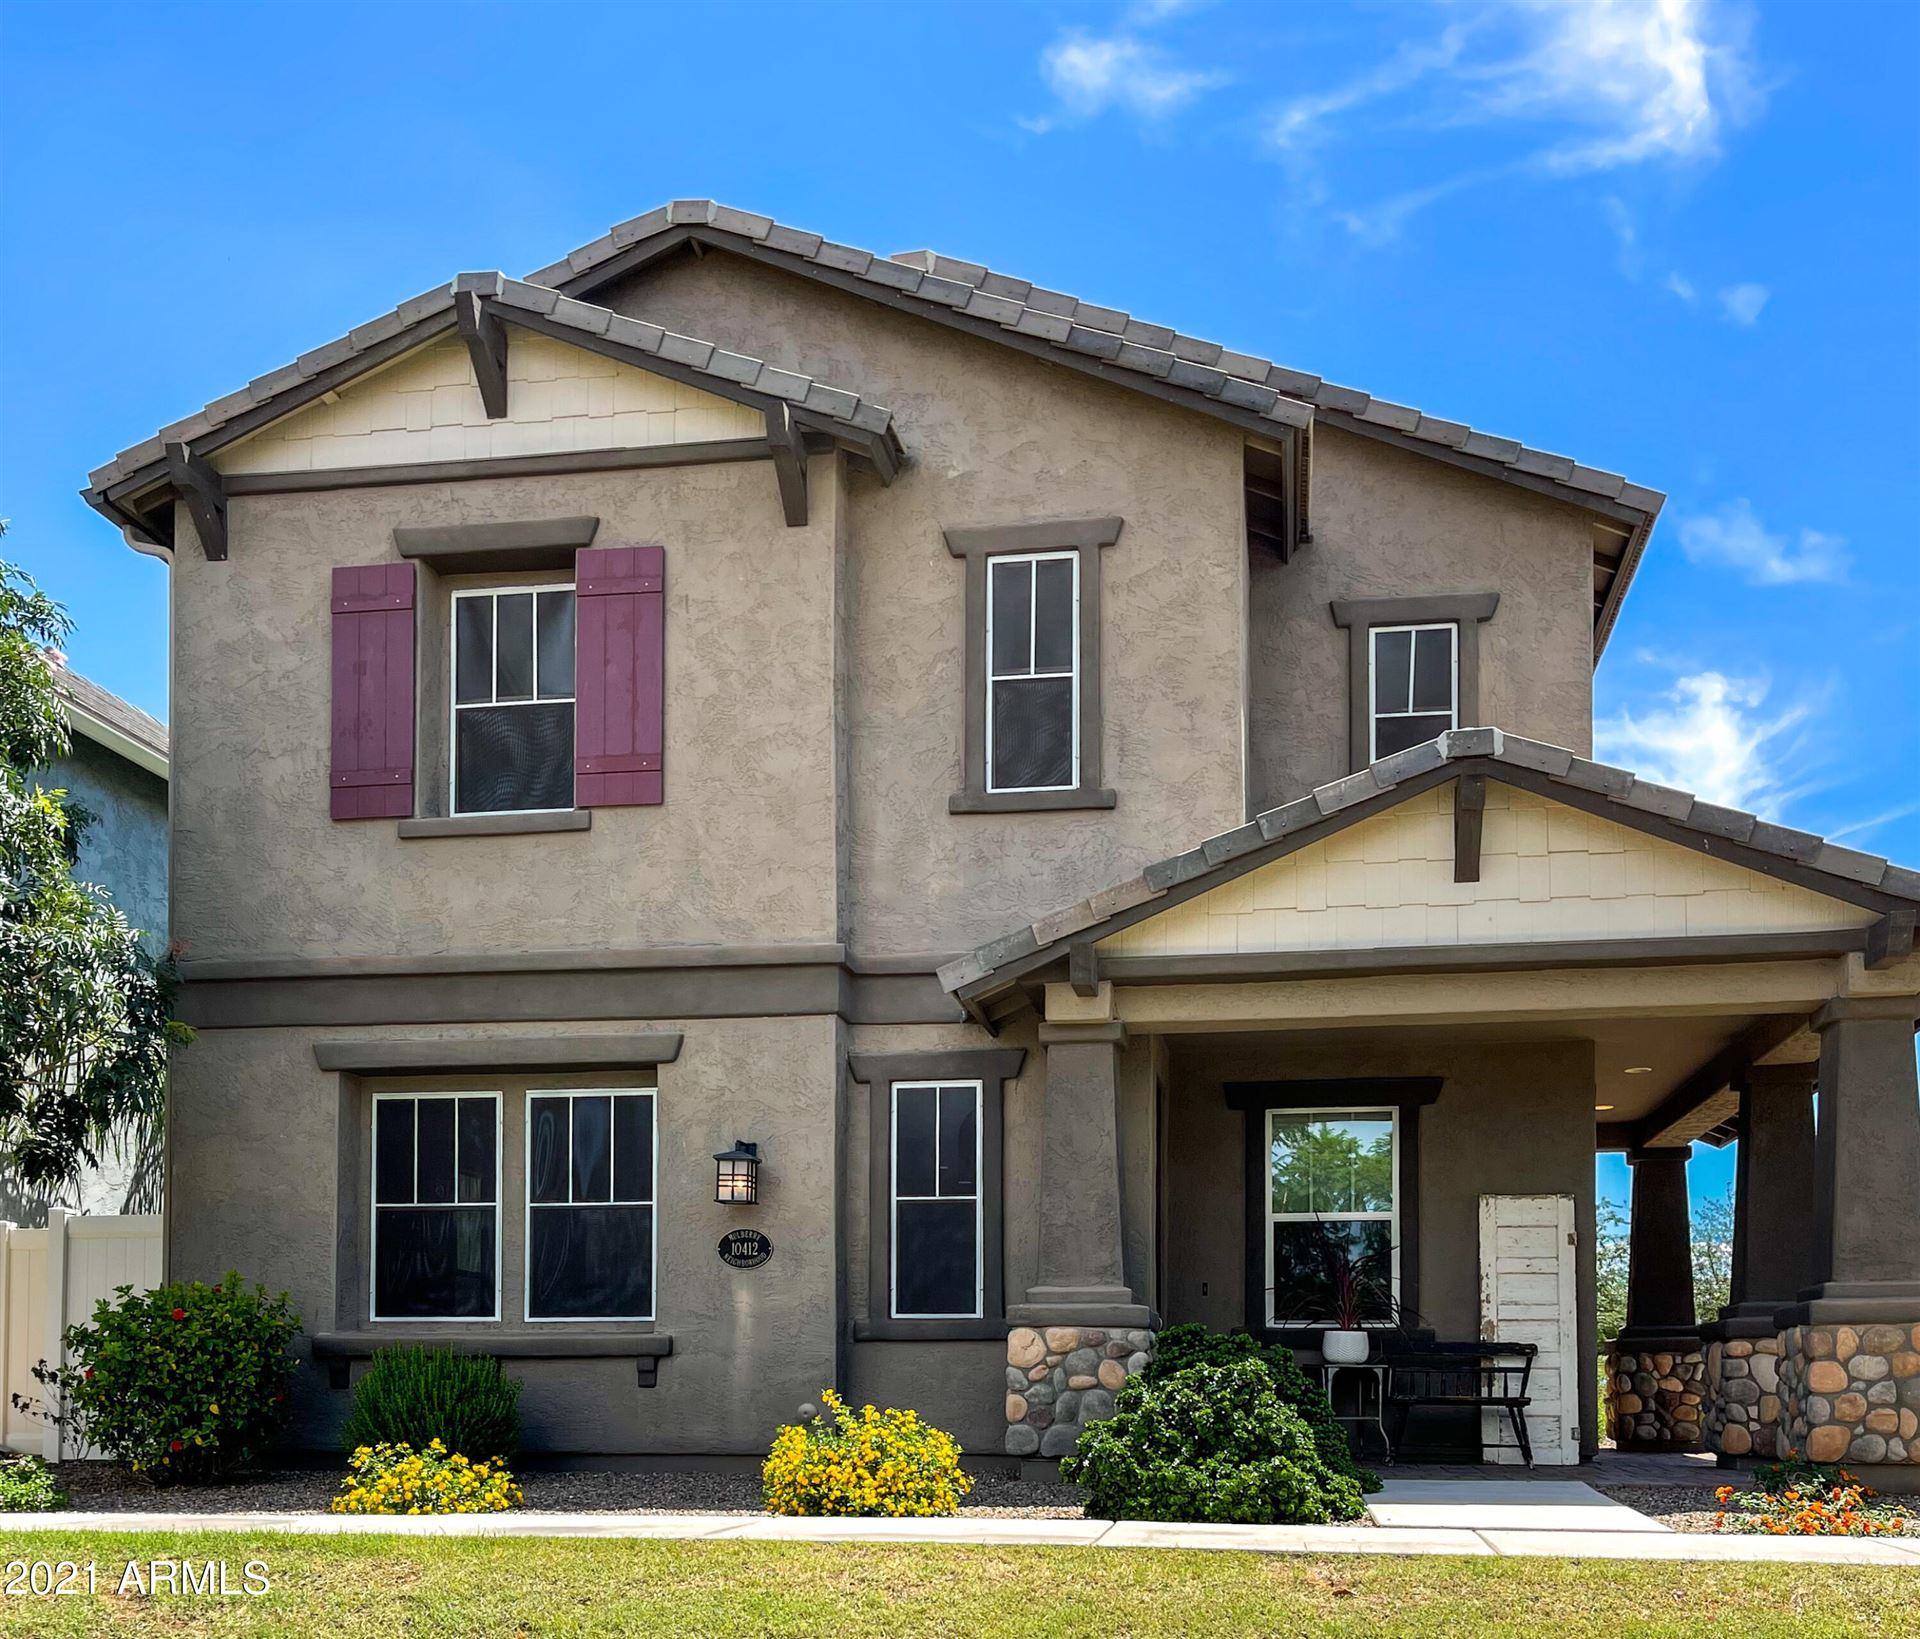 10412 E NOPAL Avenue, Mesa, AZ 85209 - MLS#: 6272882